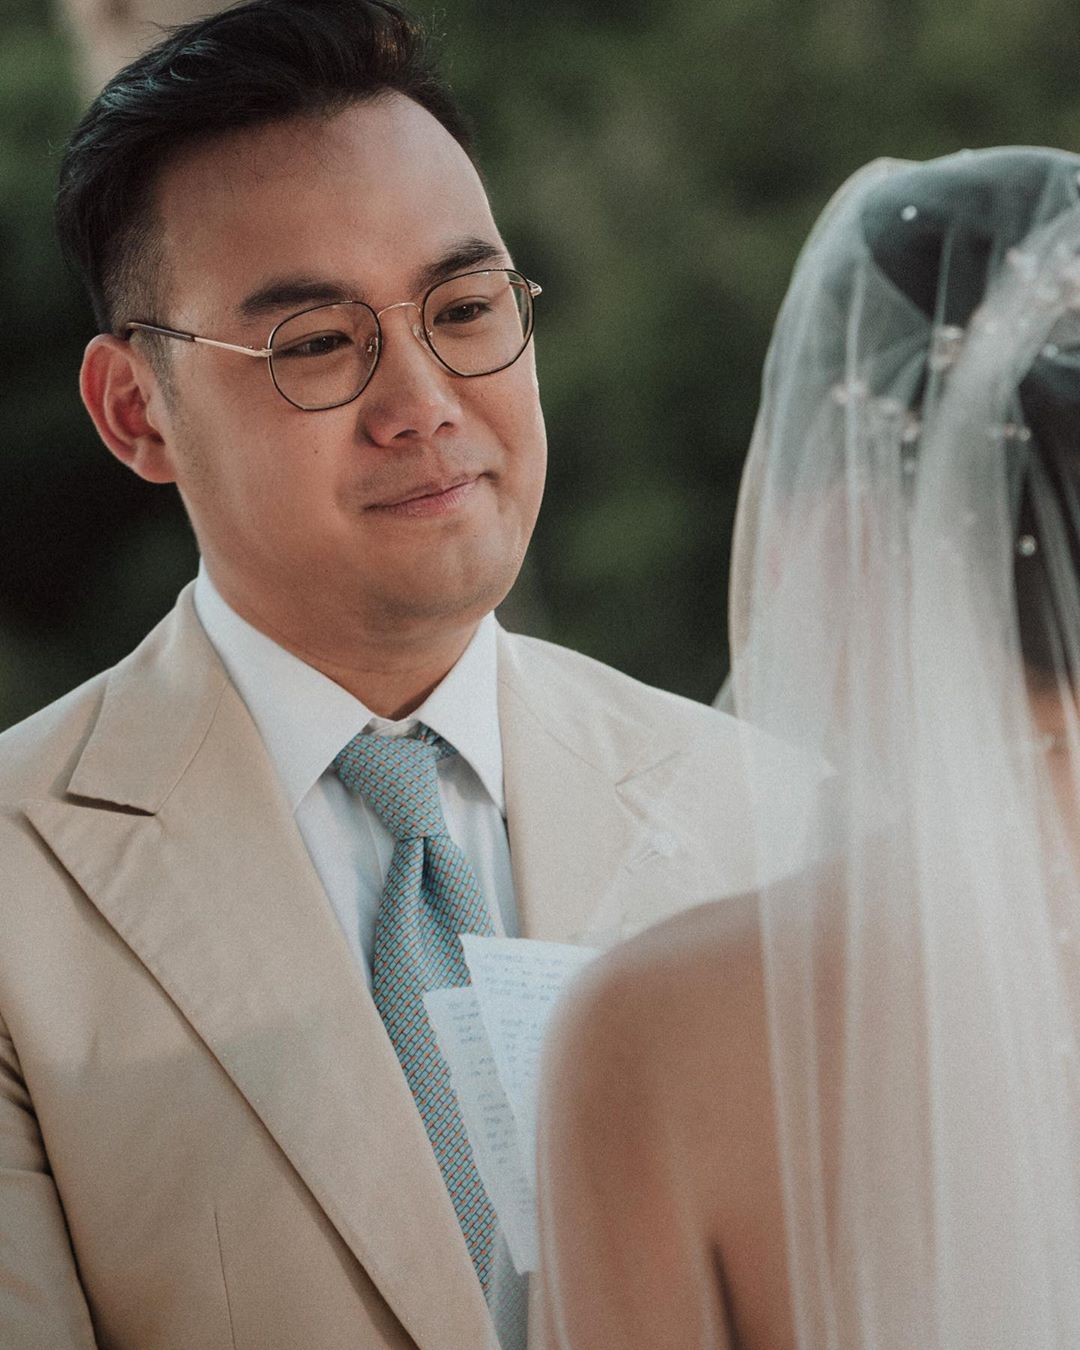 realweddings angel yeo and brian liu 0